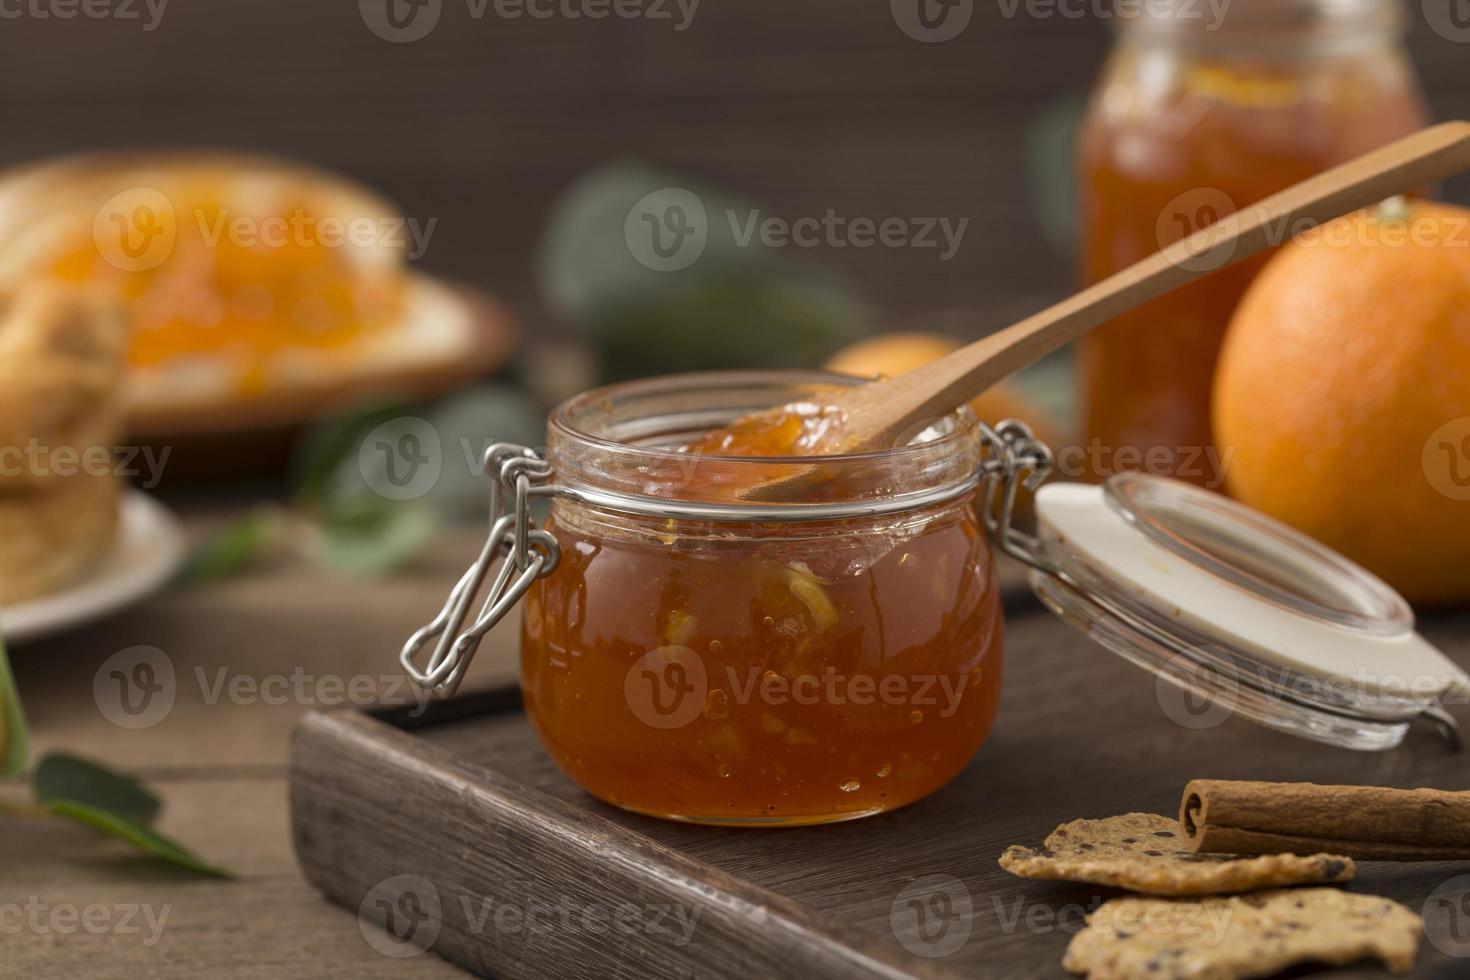 Organic homemade marmalade with spoon photo